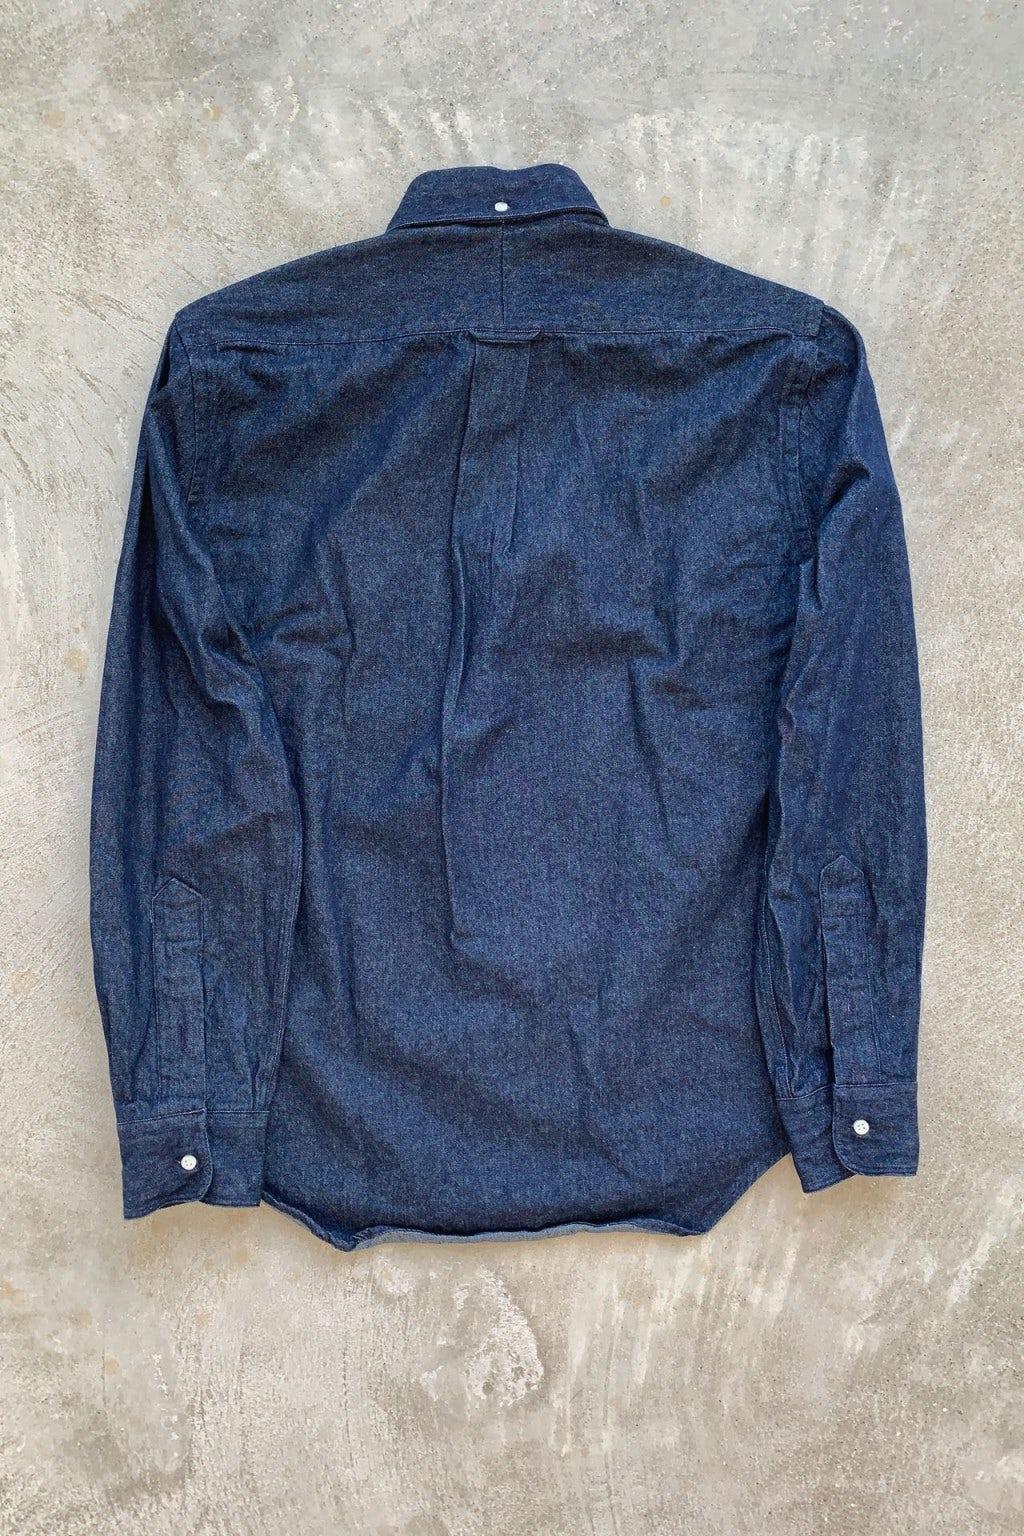 Gitman Bros. Vintage Long Sleeve Button Down  Dark Denim